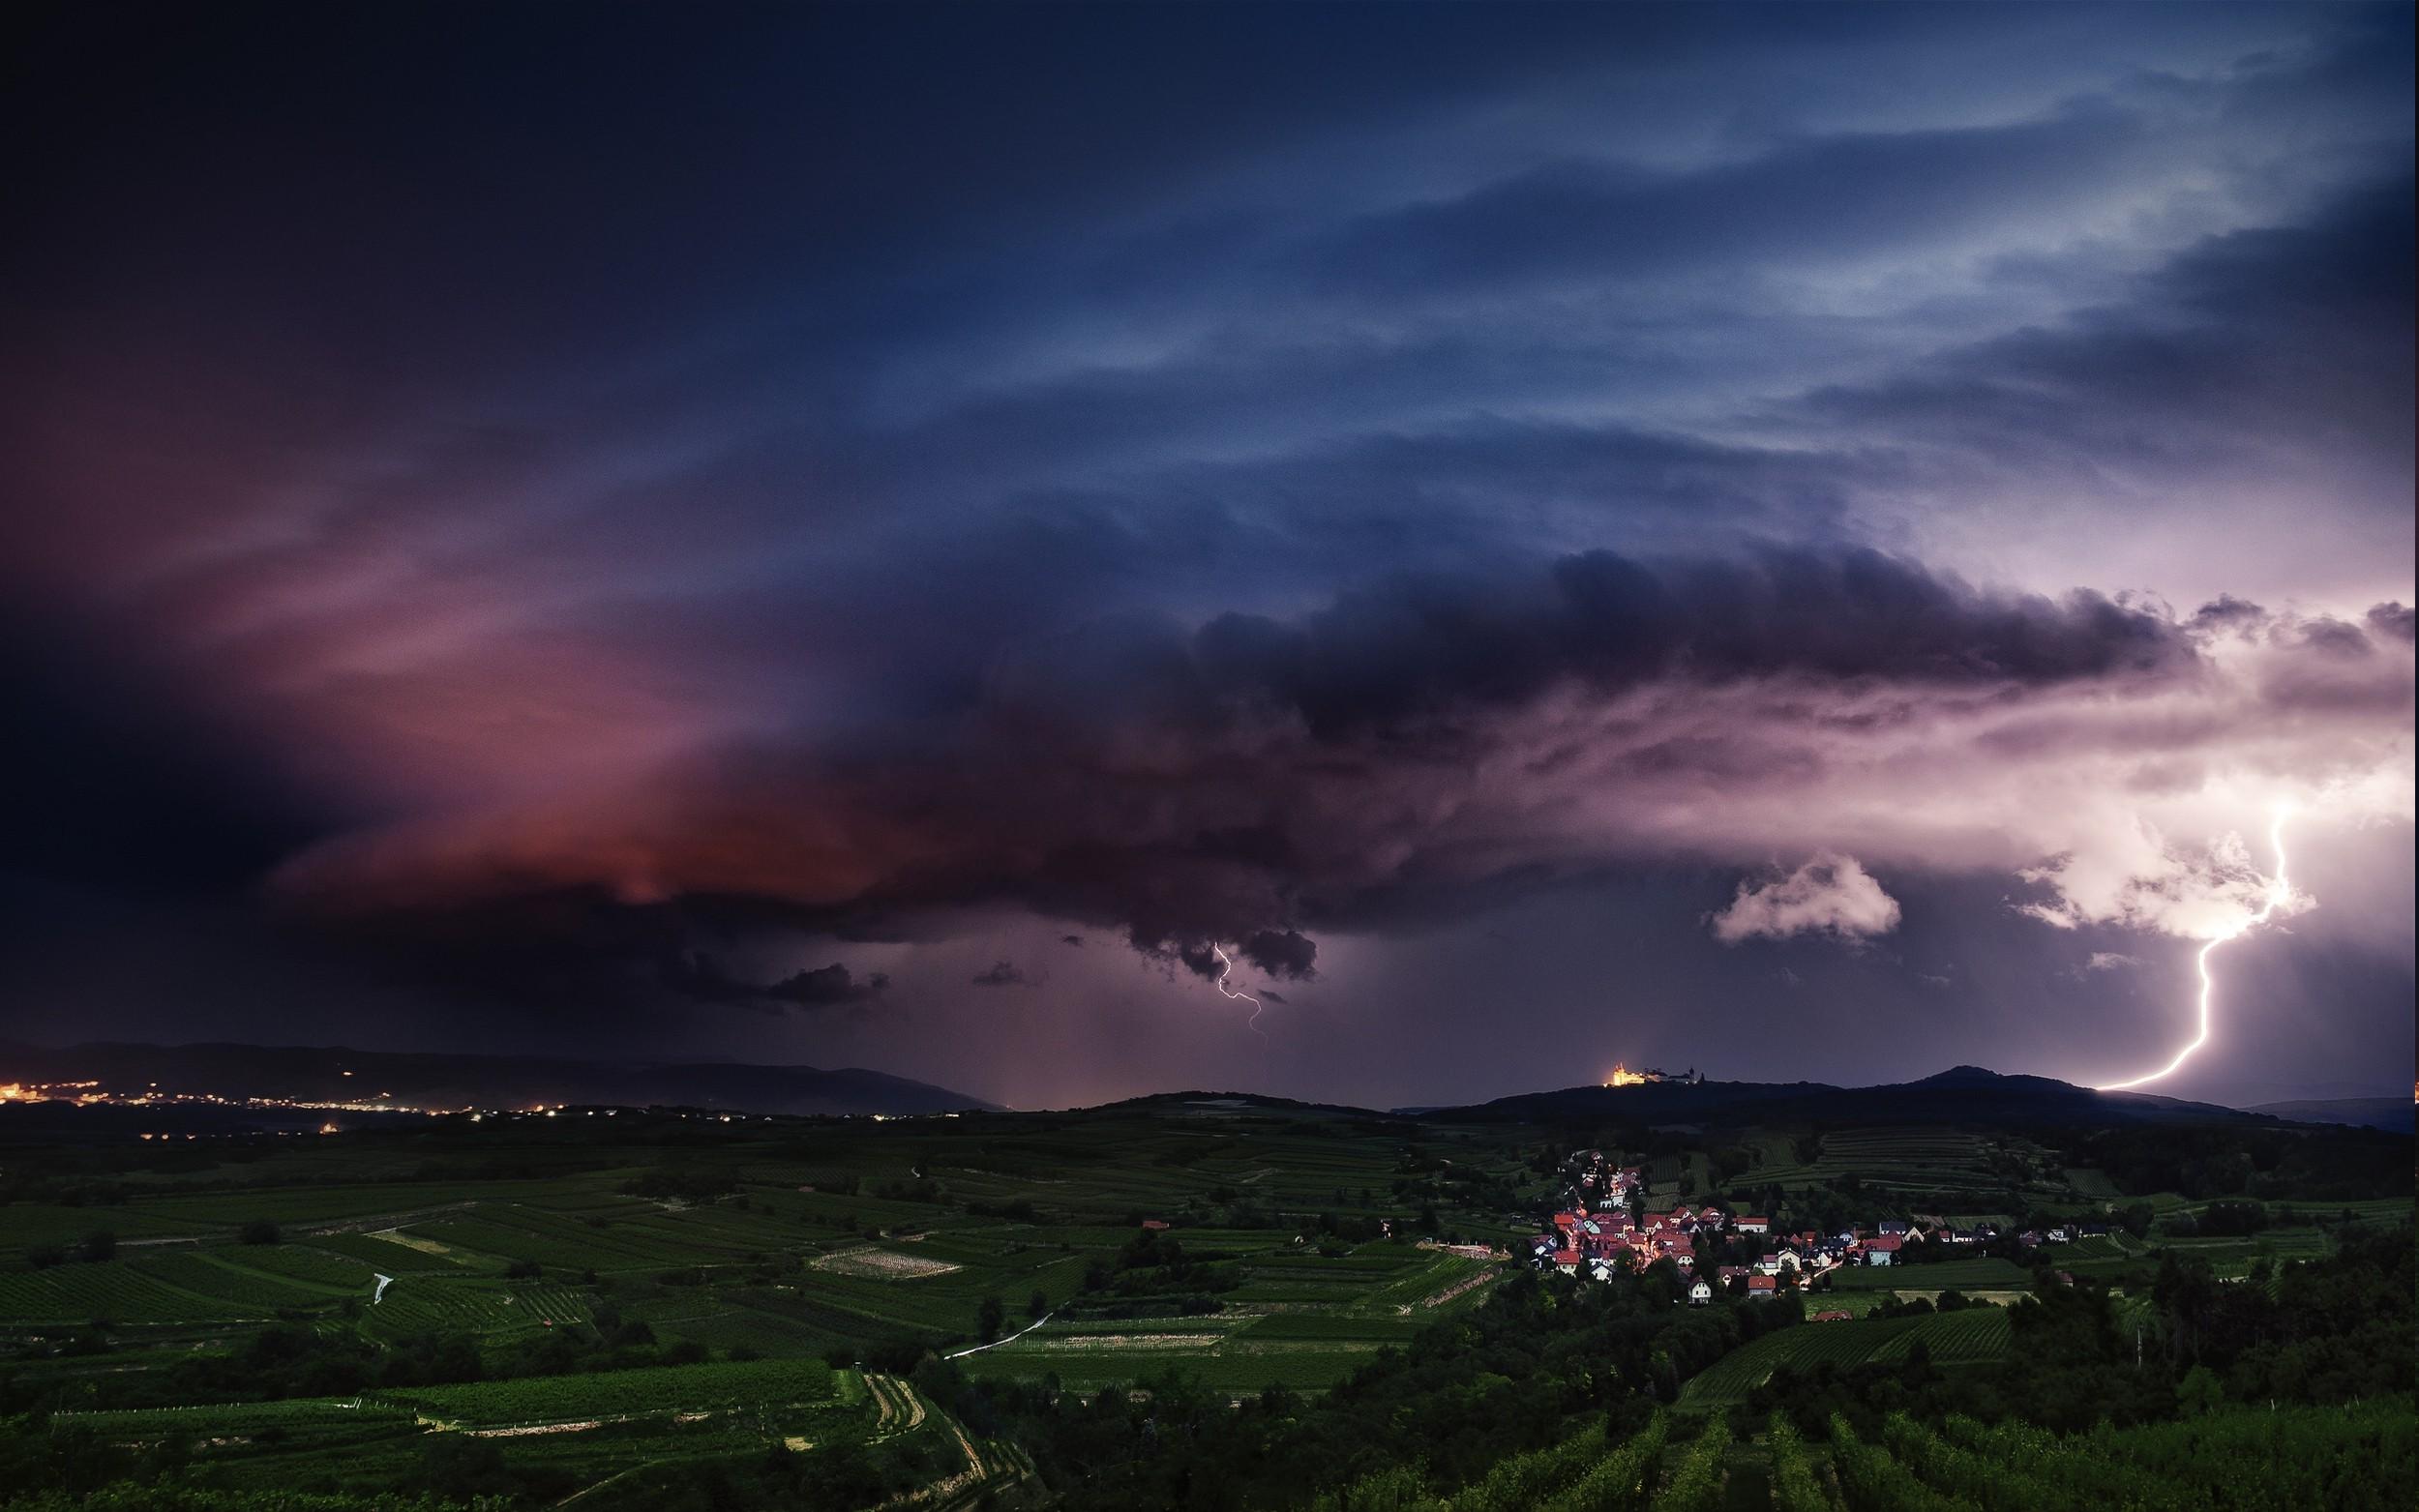 landscape Nature Lightning Storm Supercell Hill 2500x1563